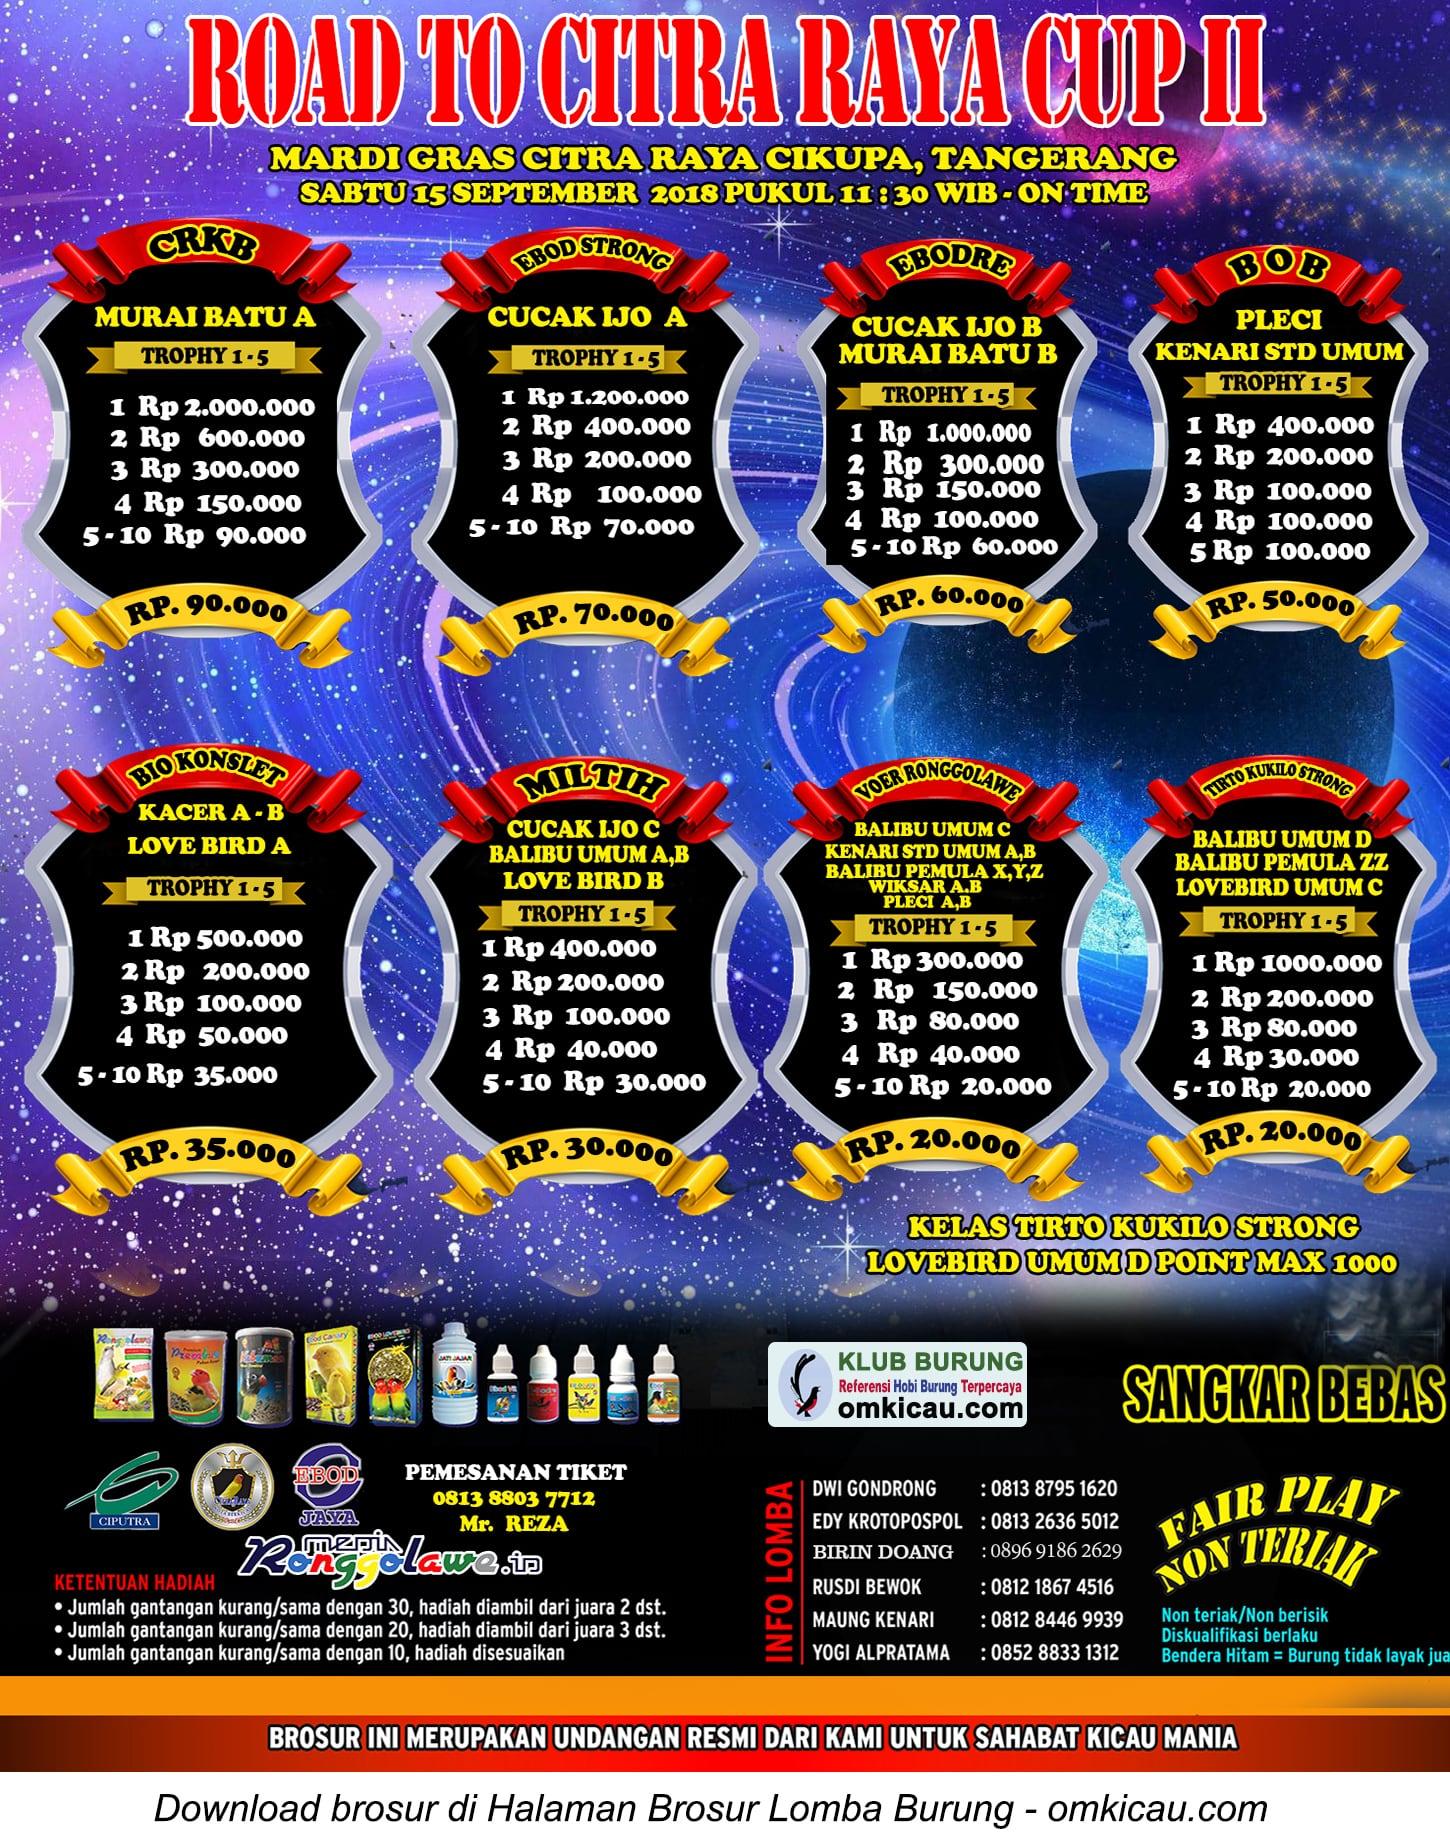 Road to Citra Raya Cup II